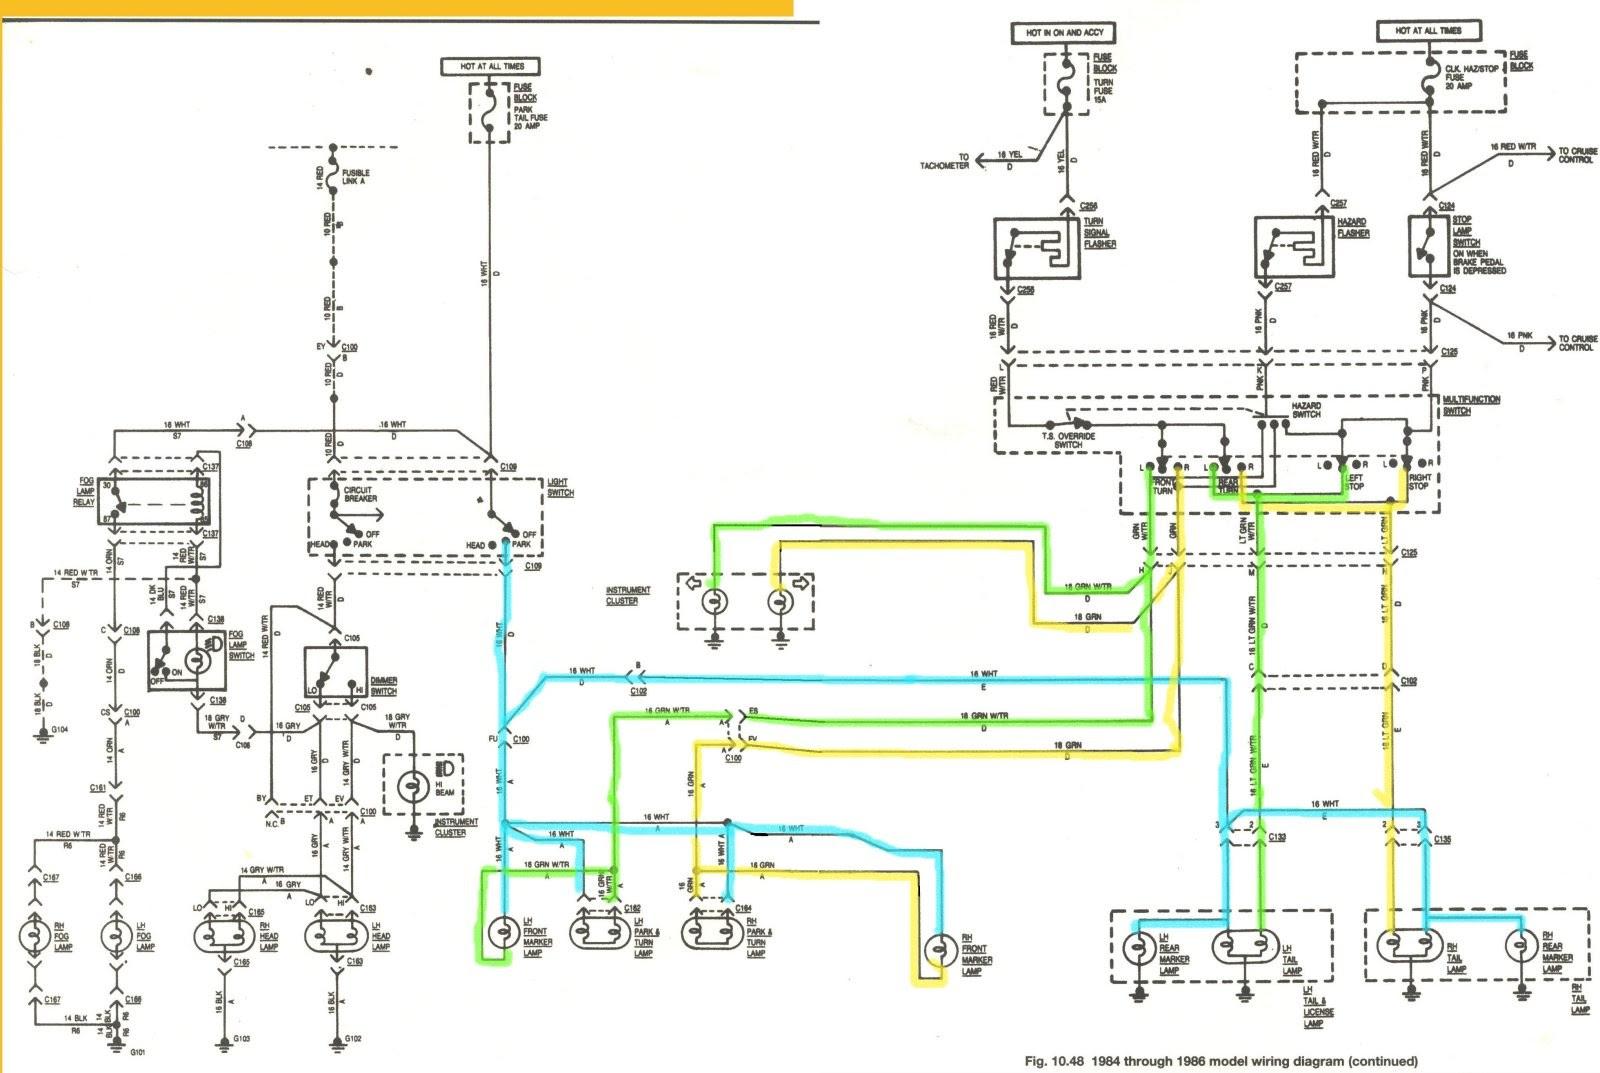 2007 Jeep Wrangler Headlight Wiring Diagram - Wiring Diagram